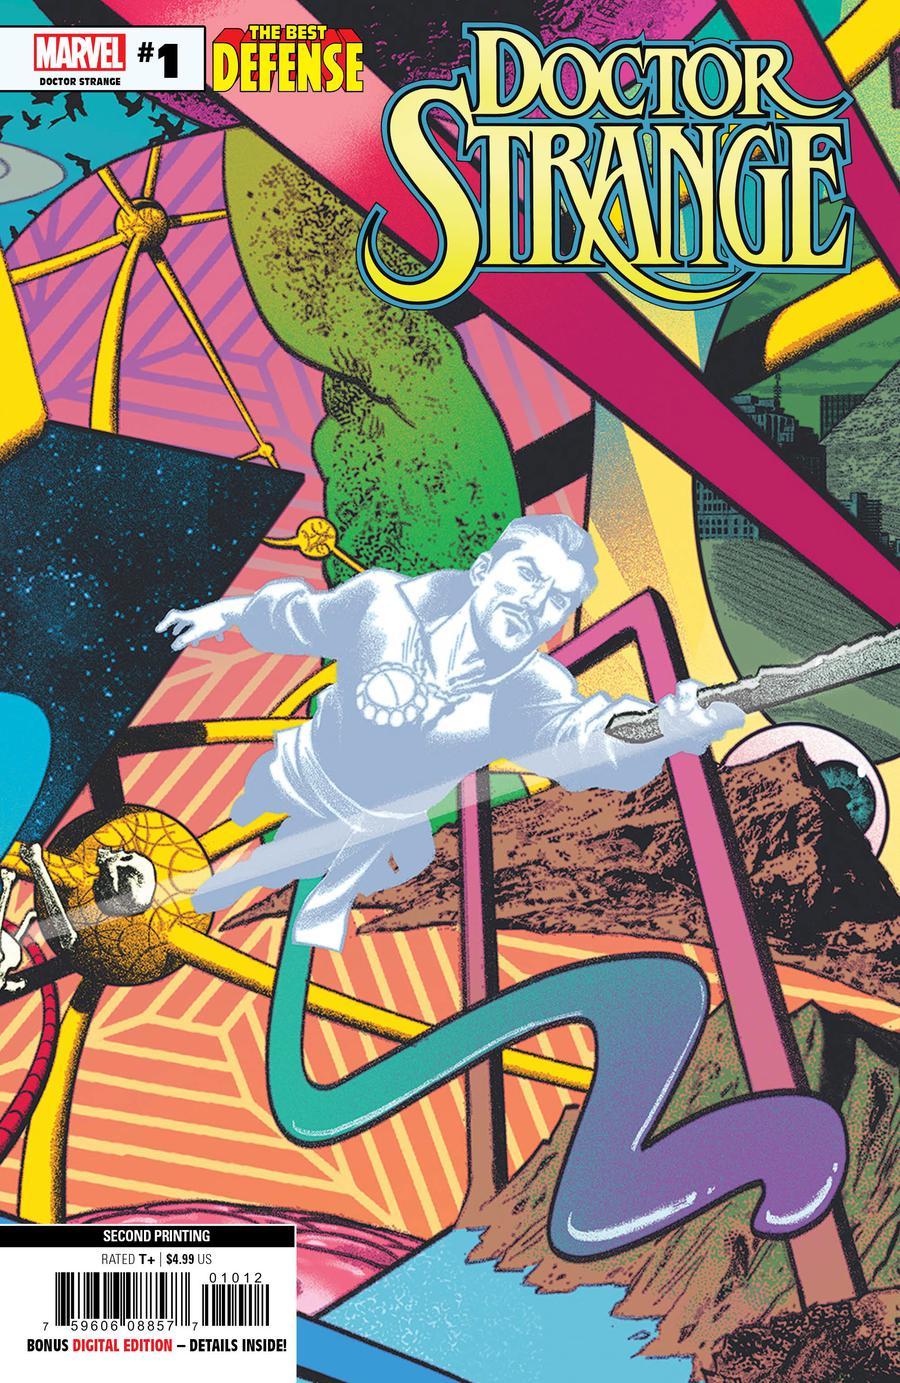 Defenders Doctor Strange #1 Cover F 2nd Ptg Variant Greg Smallwood Cover (Best Defense Part 3)